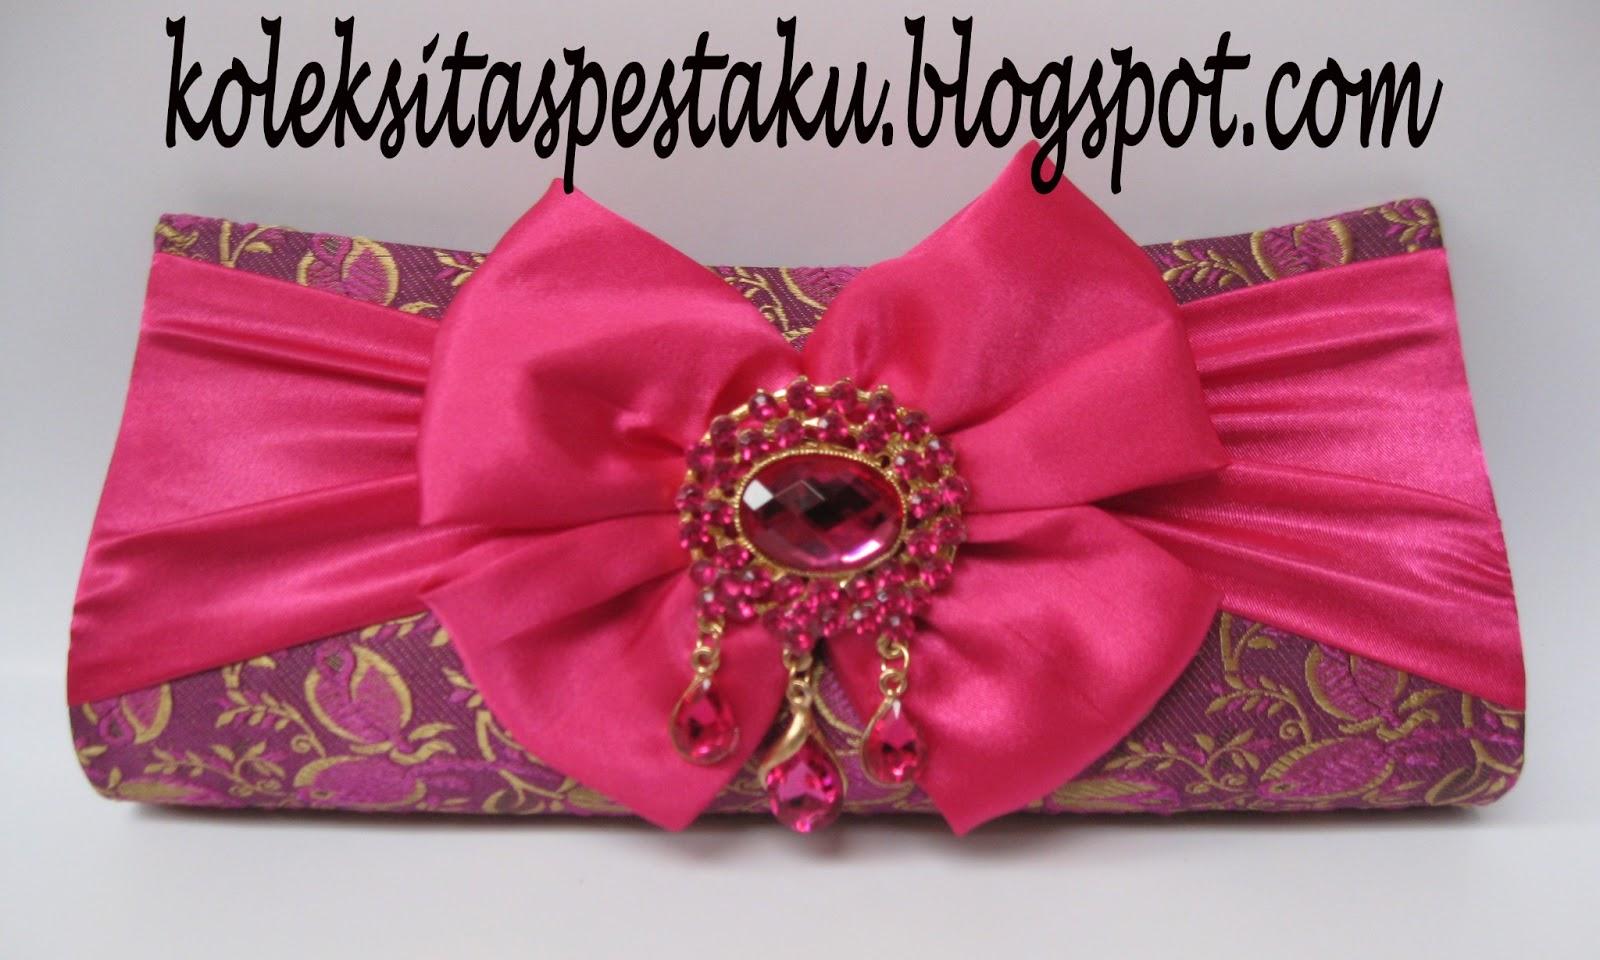 Shocking Pink Clutch Bag Cantik Koleksi Tas Pesta Ku dgn Harga Terjangkau  Murah (SOLD OUT) f251710f91